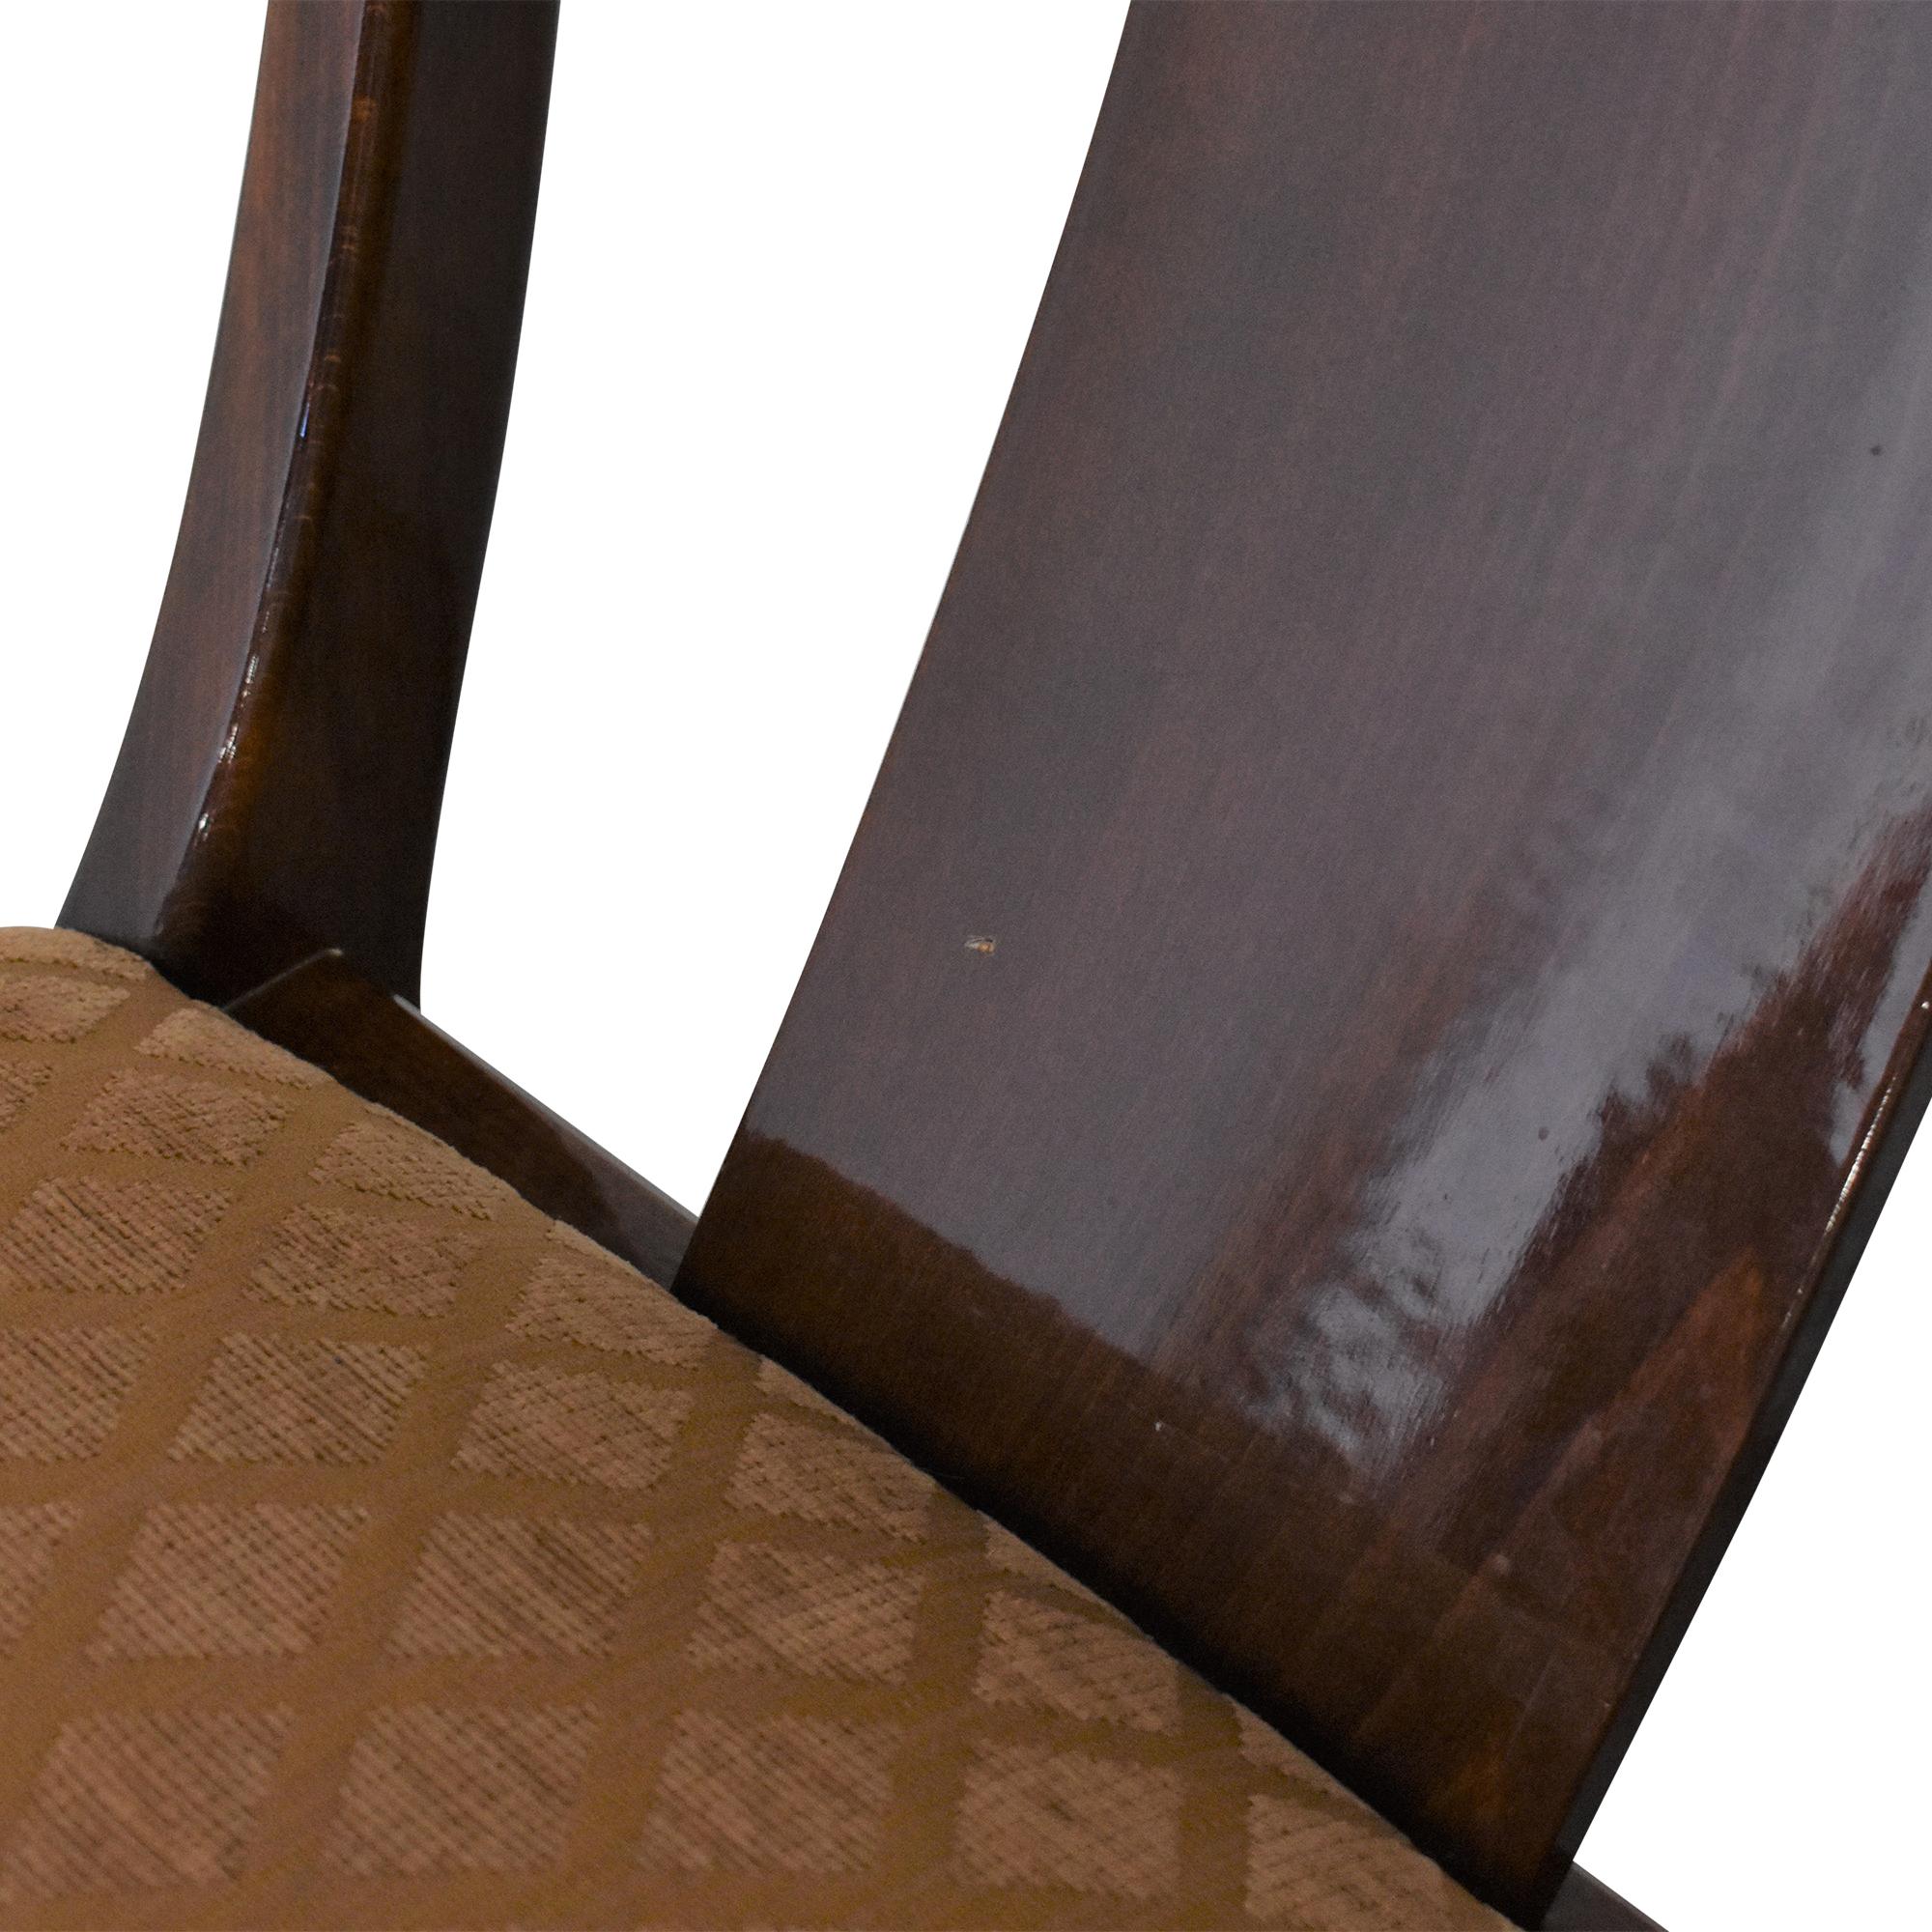 Ello Furniture Pietro Constantini for Ello Klismos Dining Chairs pa